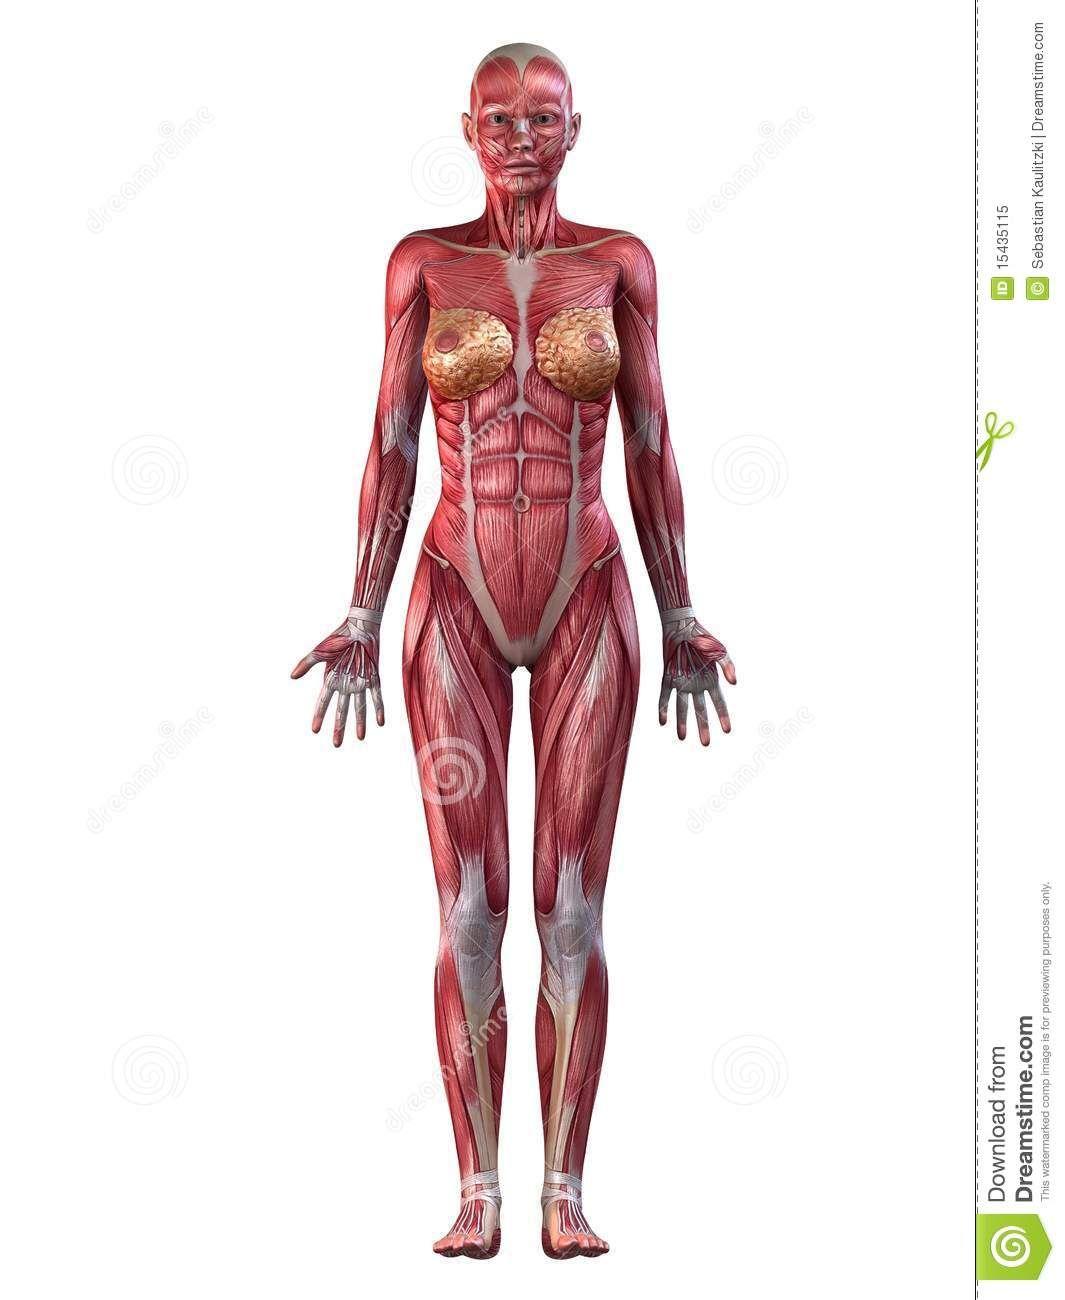 sistema muscular femenino - Buscar con Google | muscle | Pinterest